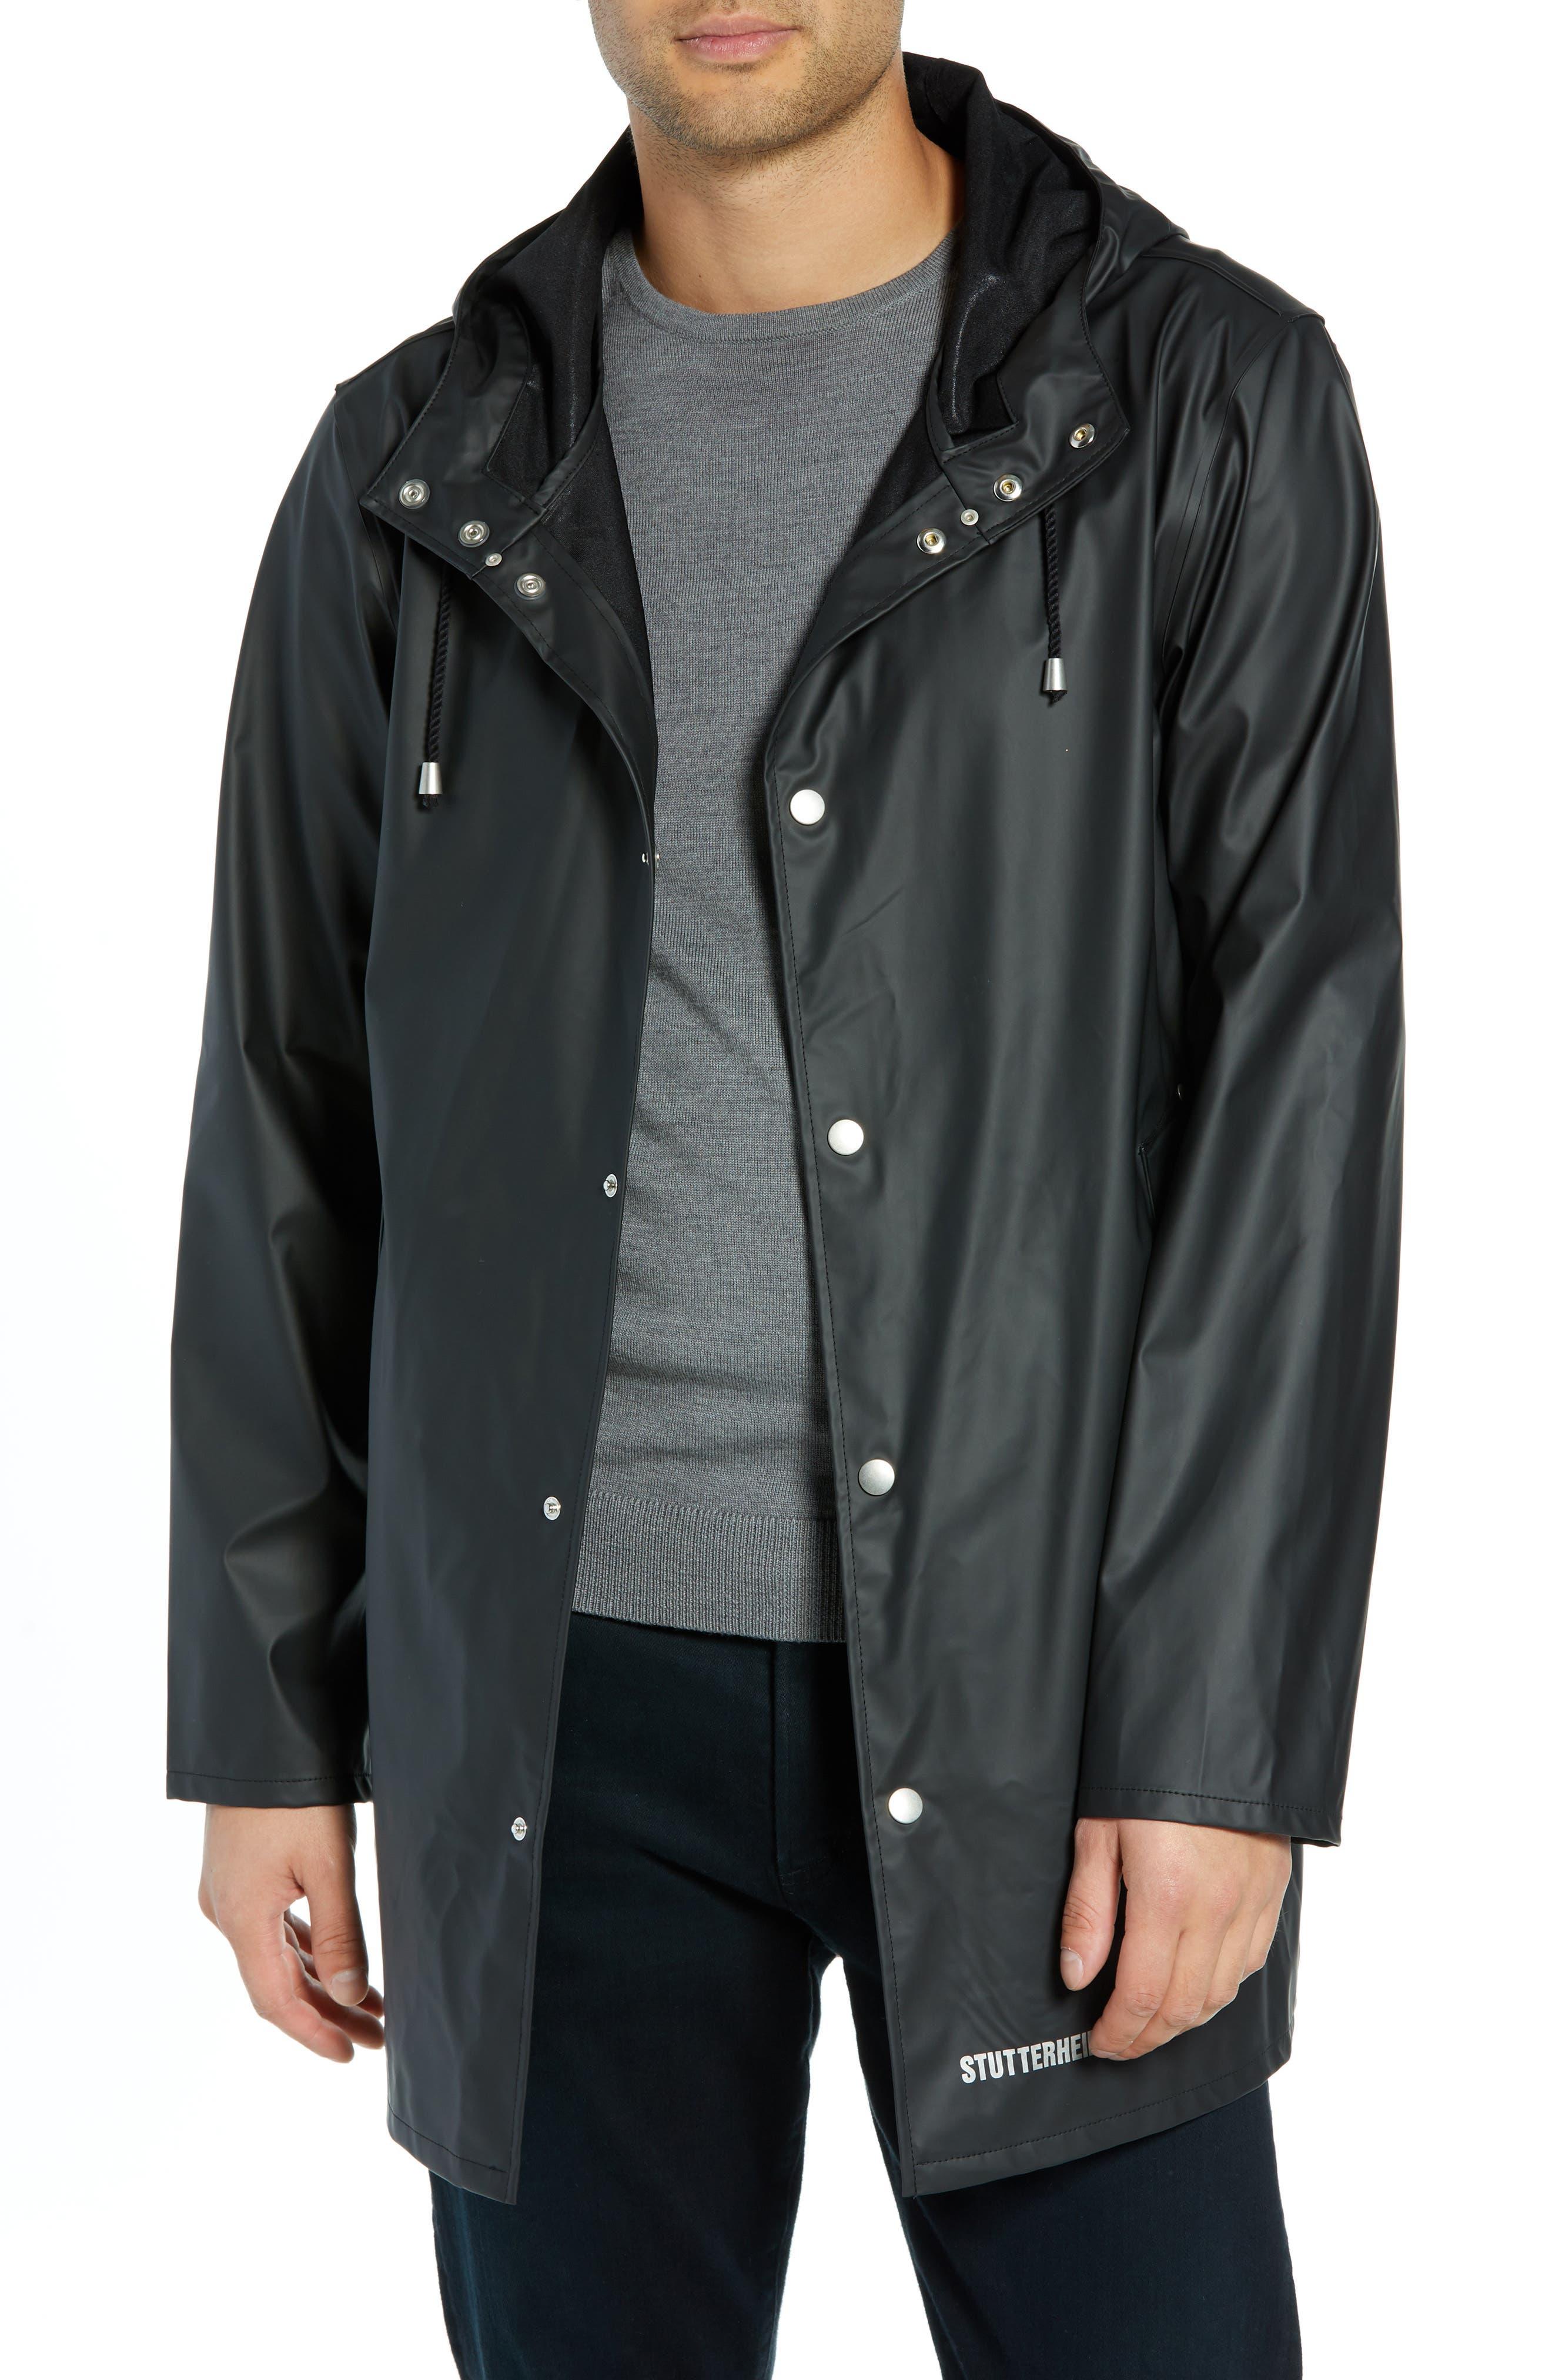 Stutterheim Stockholm Lightweight Waterproof Rain Jacket, Black